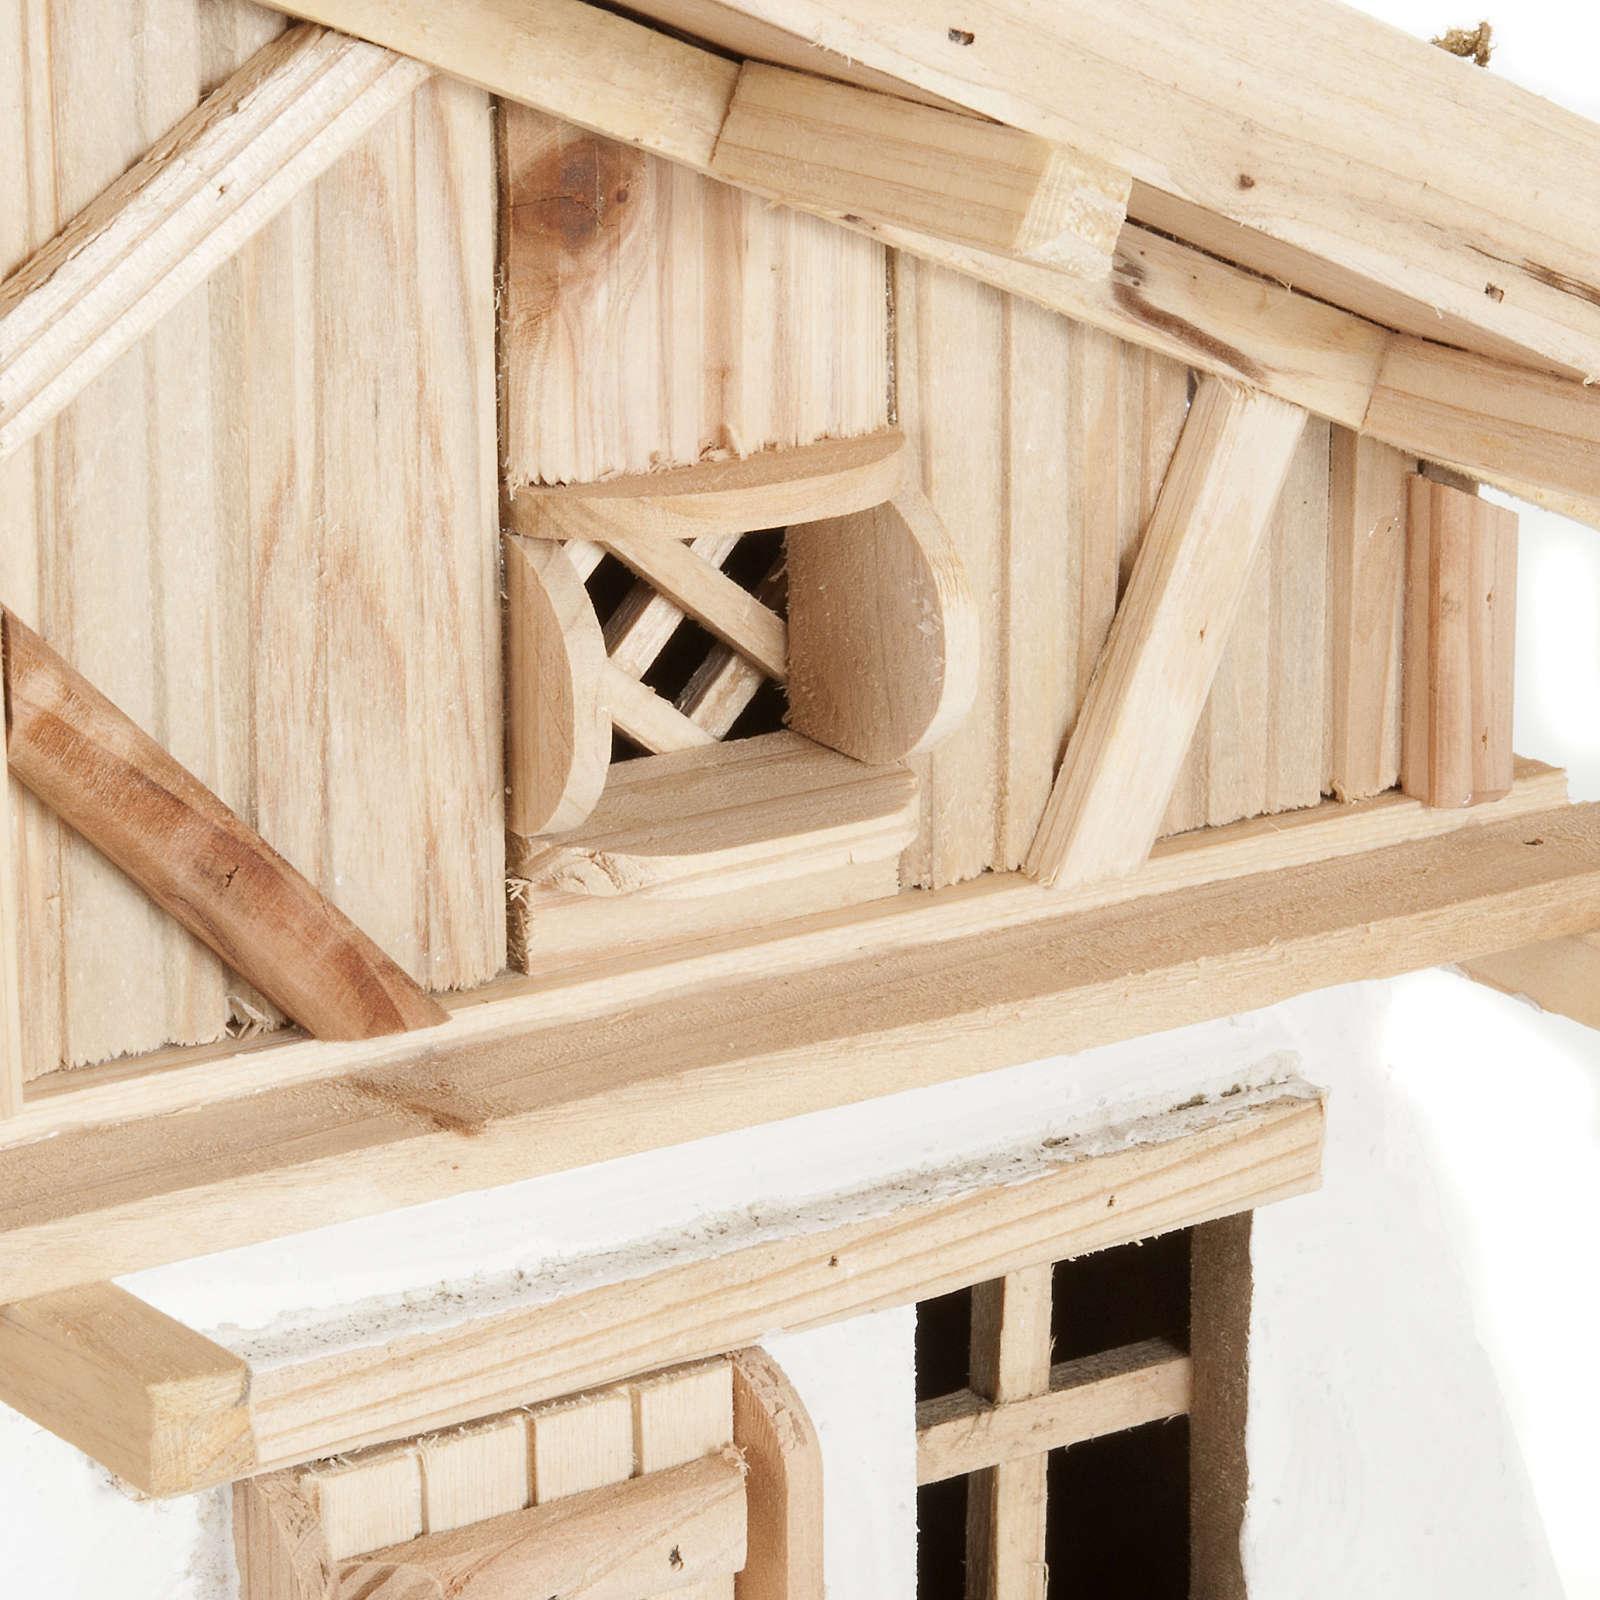 Capanna presepe legno naturale 60x30x30 cm 4